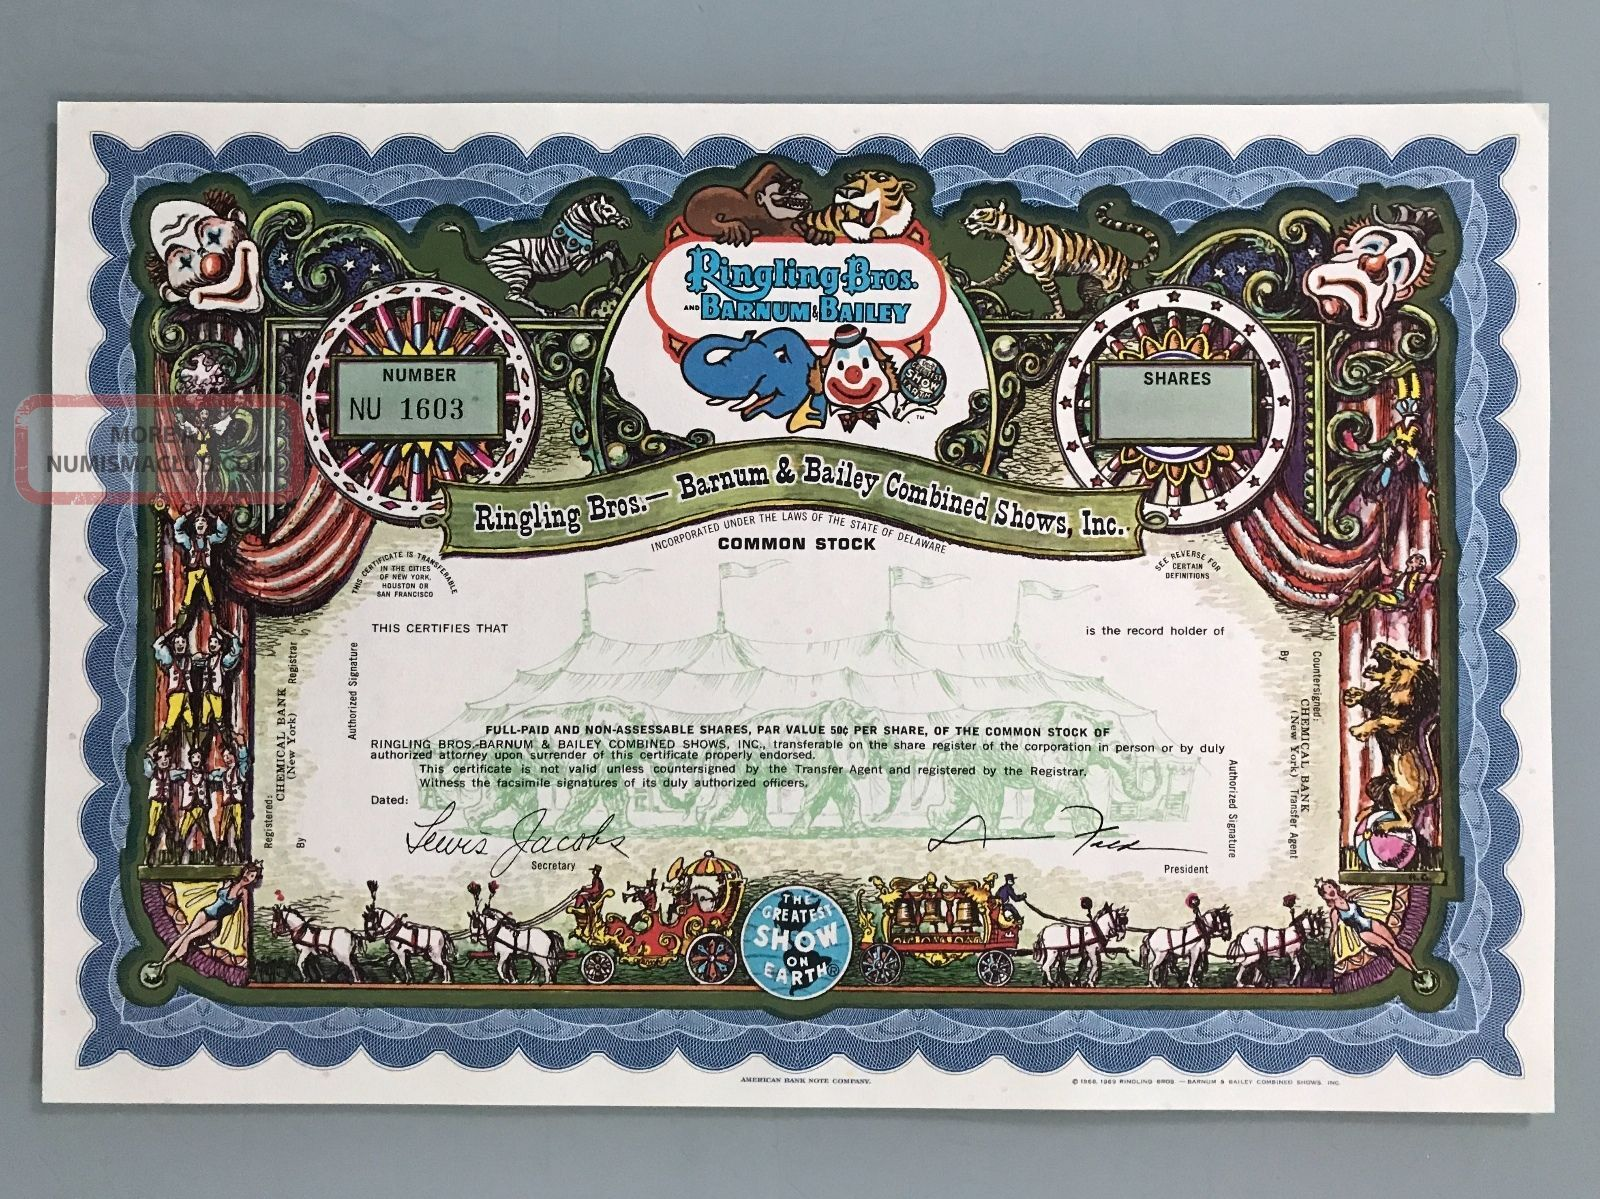 Ringling Brothers Barnum Bailey Specimen Stock Certificate Uncirculated Stocks & Bonds, Scripophily photo